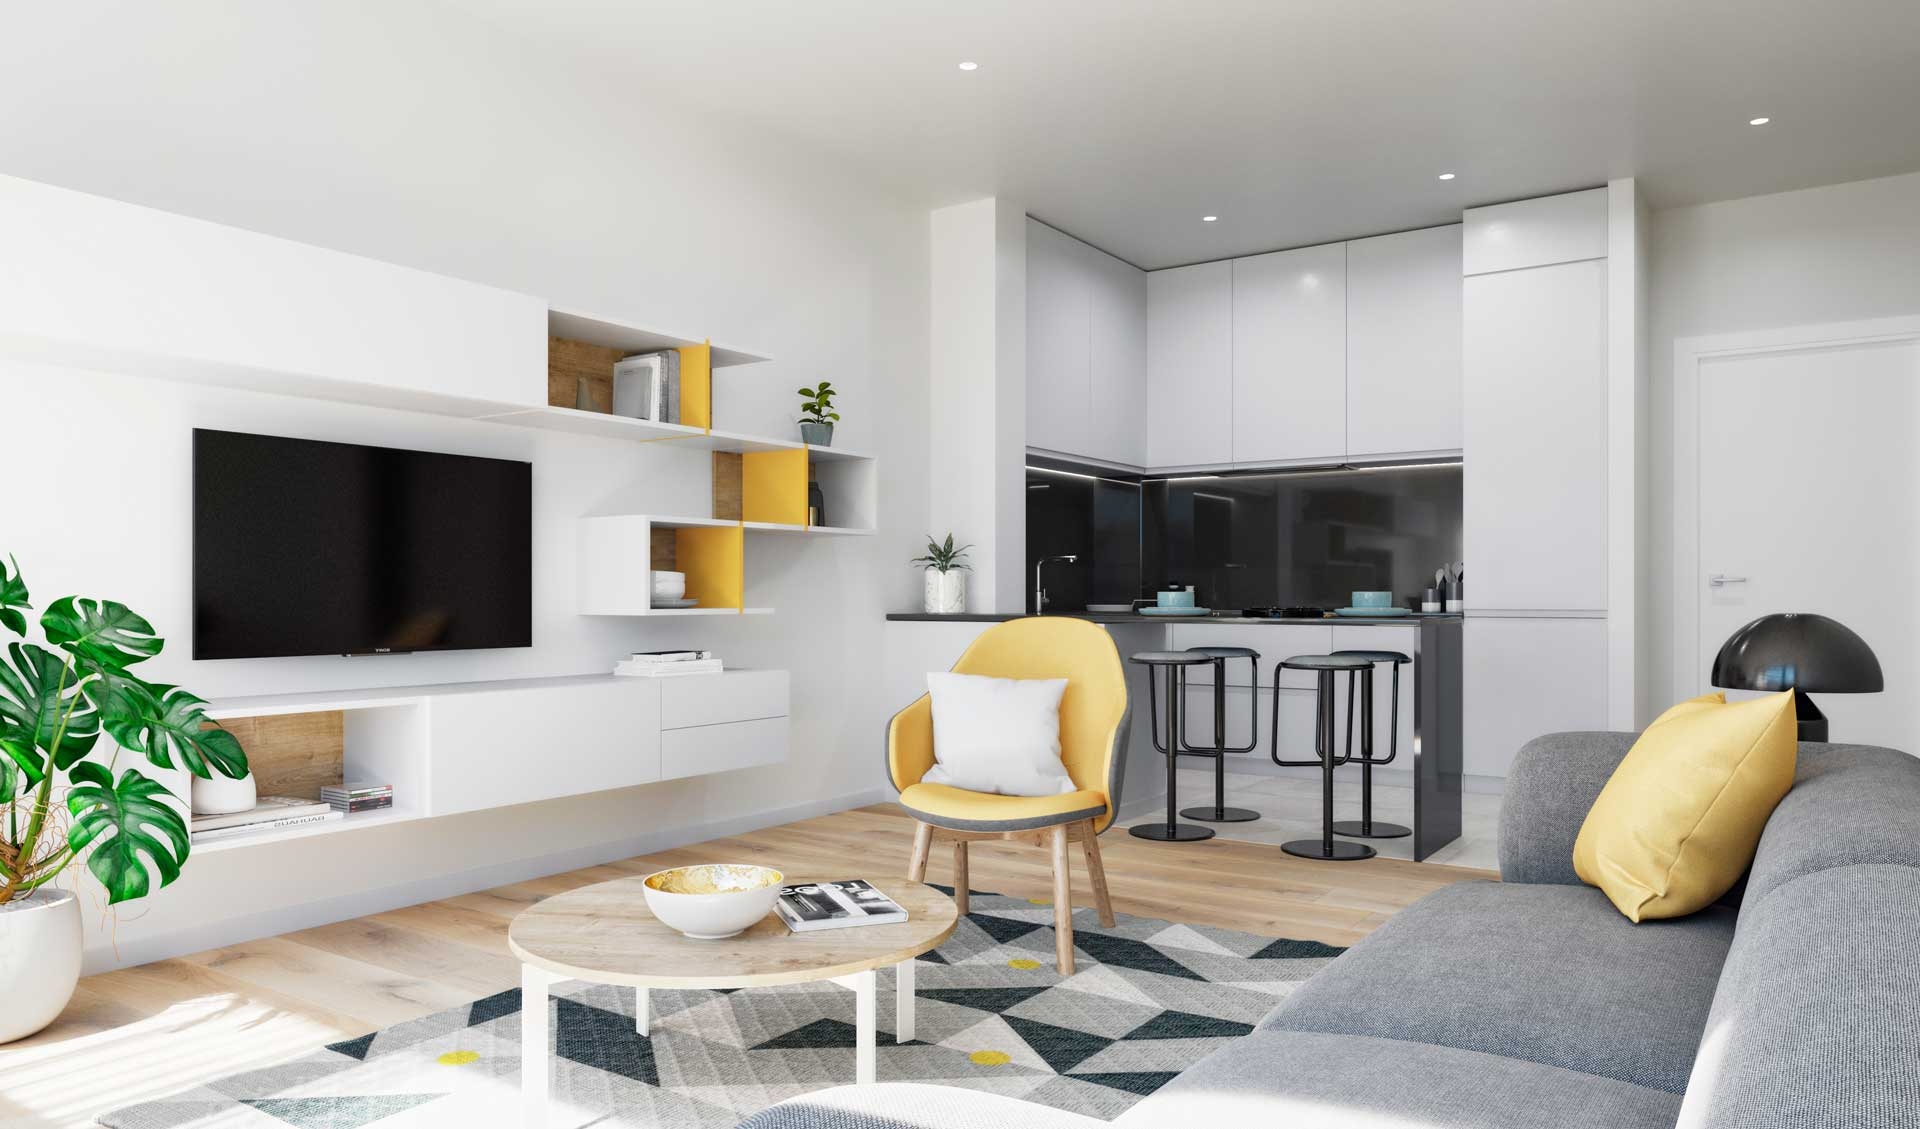 Renders interiores para Real Estate